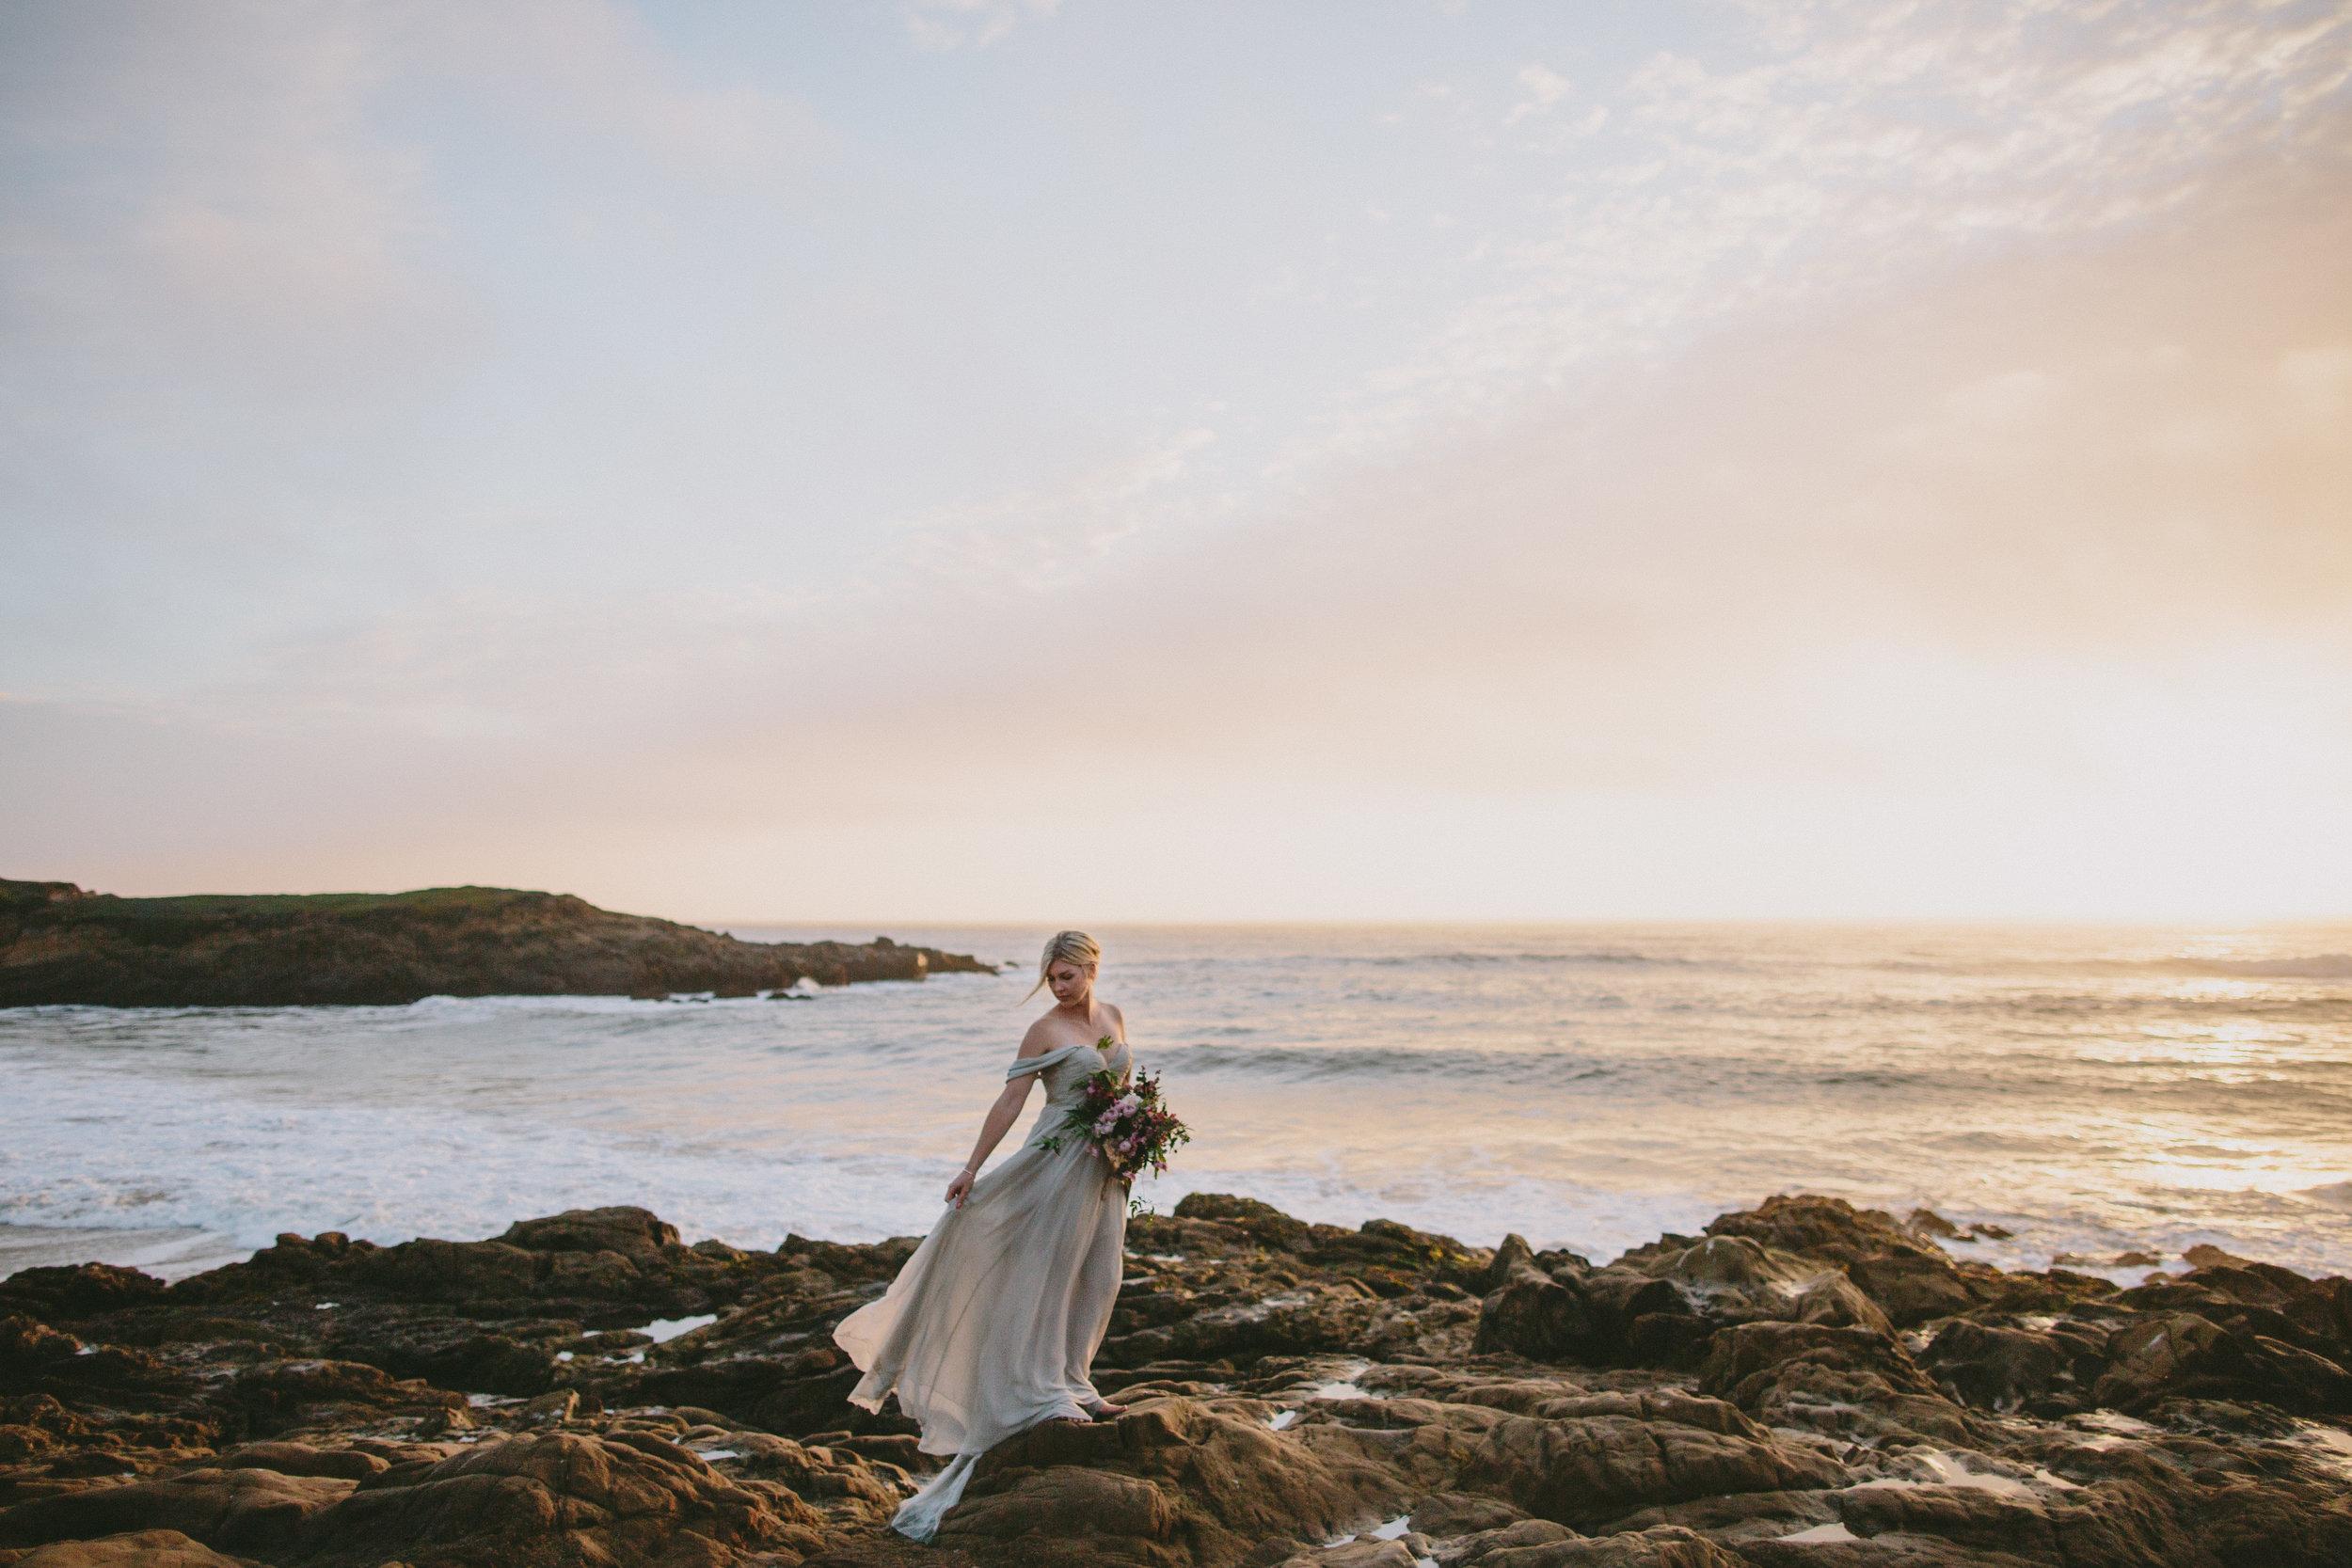 BEAN HOLLOW BEACH, SUMMER SHOOT  PHOTOGRAPHY:  SUN AND LIFE PHOTOGRAPHY